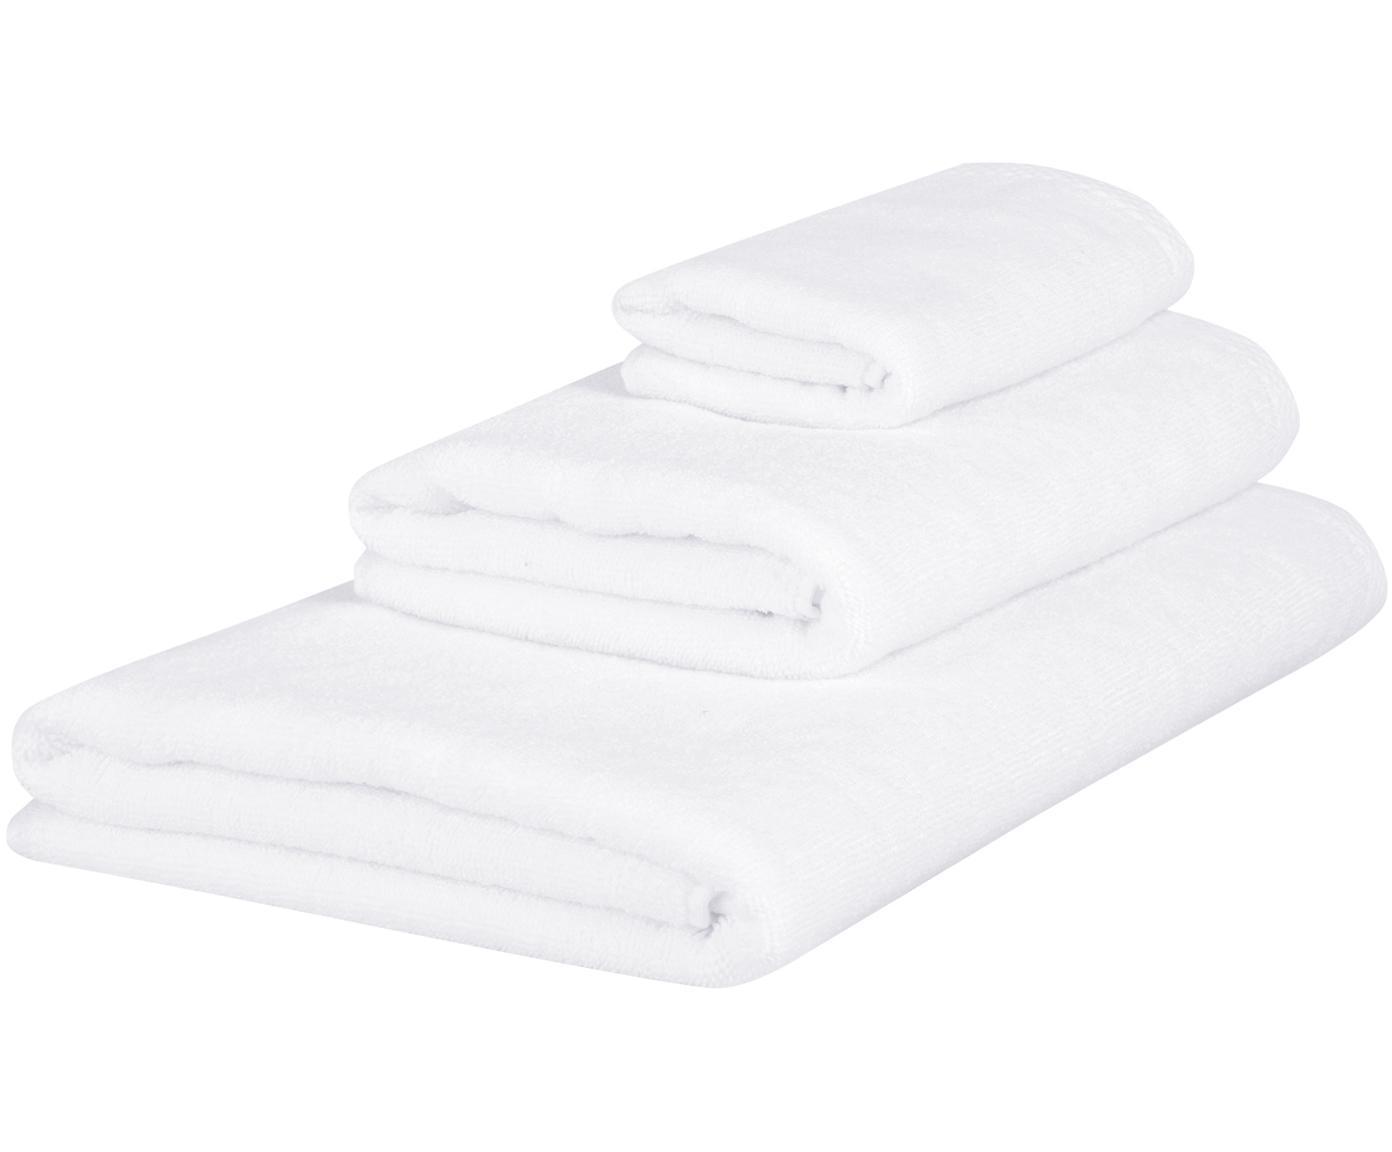 Set 3 asciugamani Comfort, Bianco, Diverse dimensioni